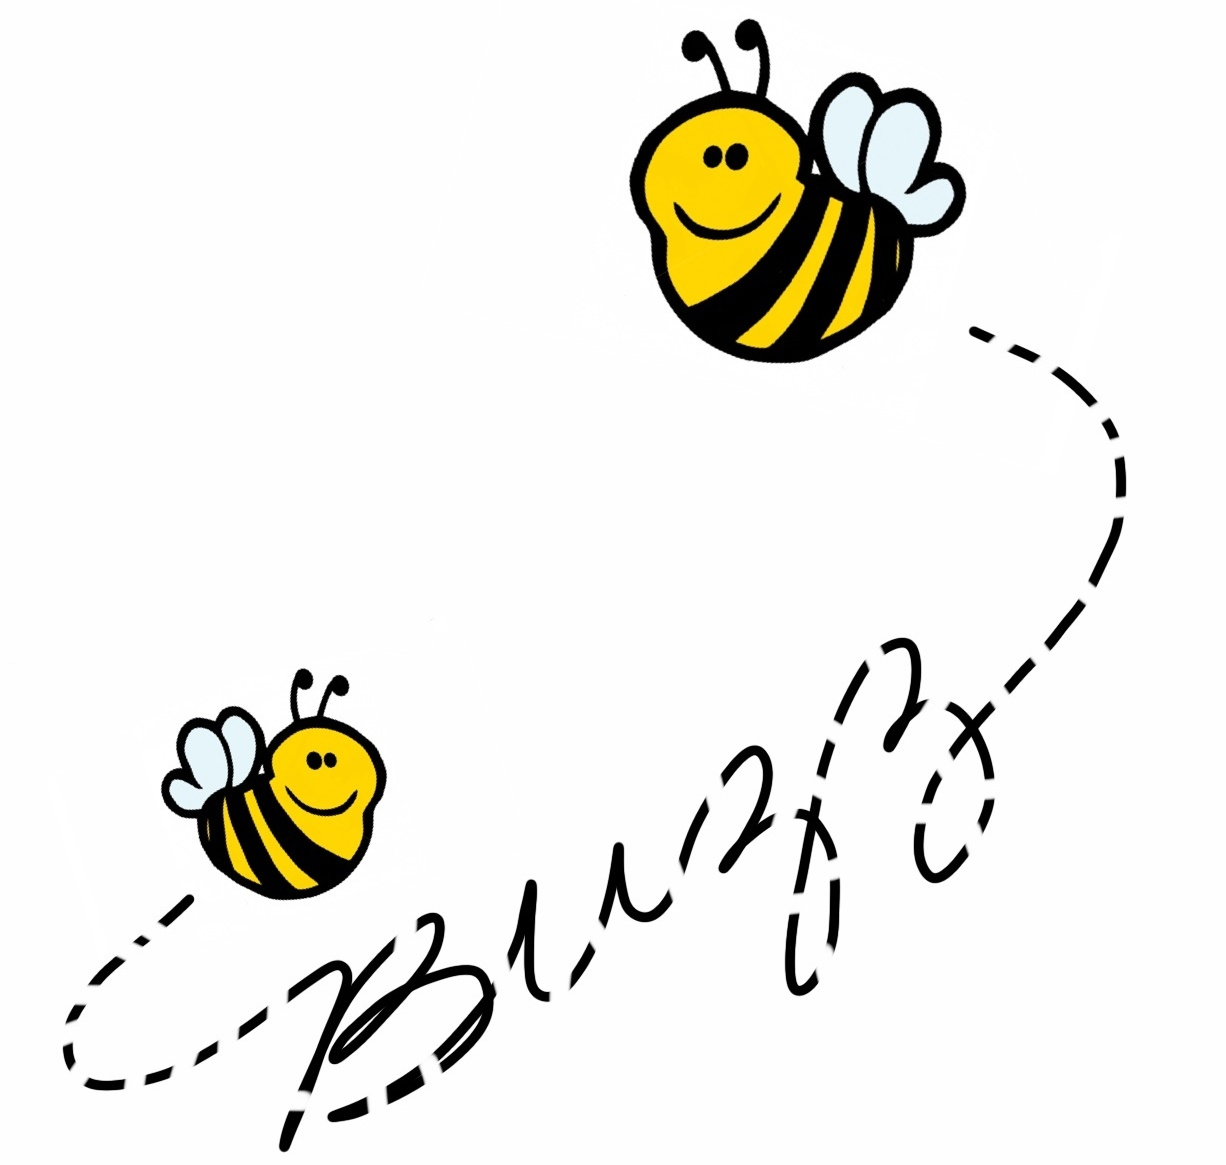 Build buzz